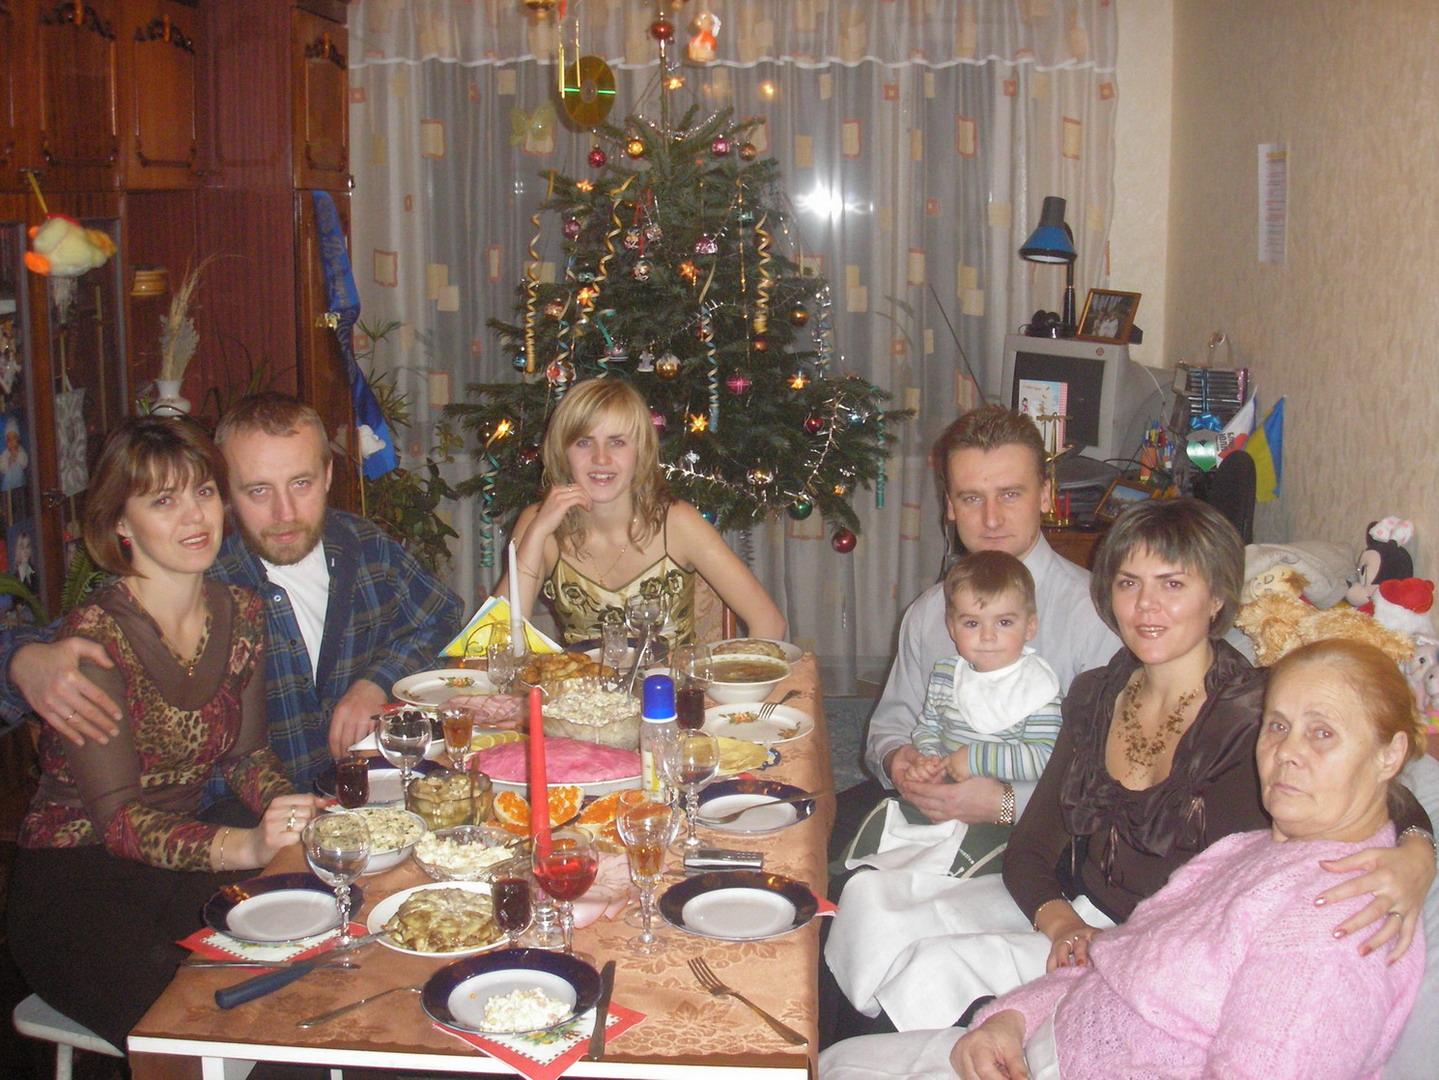 Праздник дома удался!!!. Наша дружная семья - праздник дома удался!